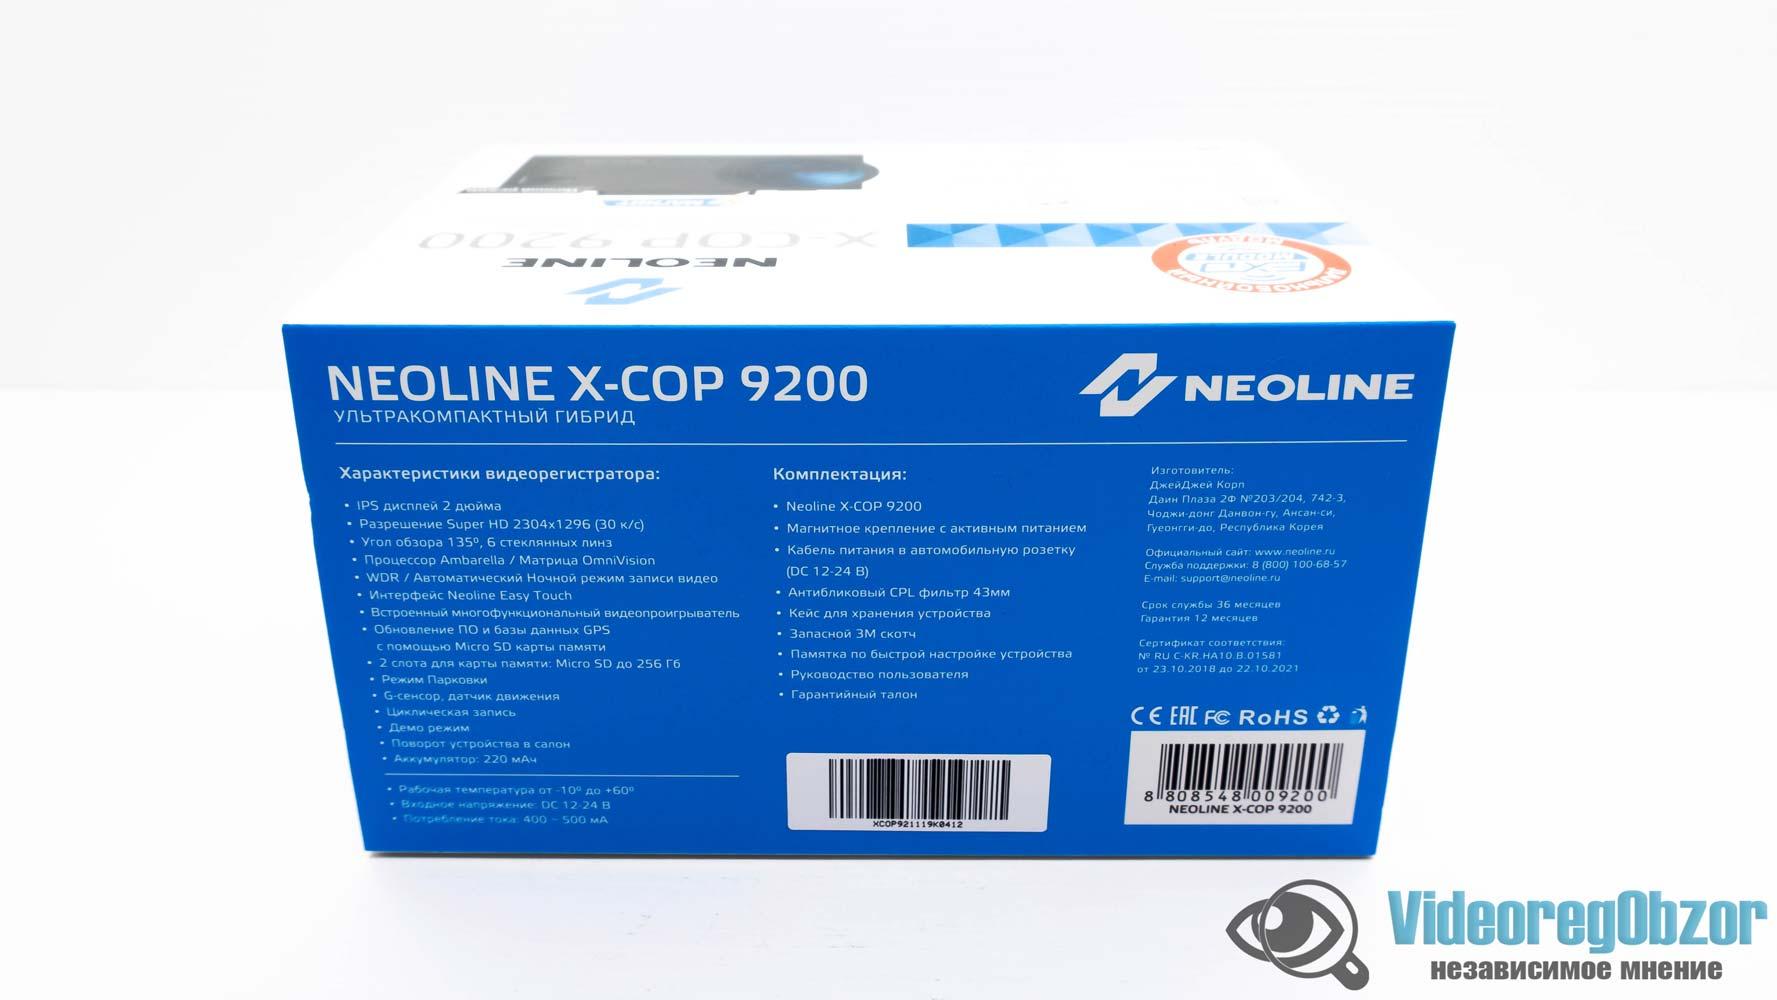 Neoline X COP 9200 обзор 3 VideoregObzor Neoline X-COP 9200: обзор видеорегистратора с радар-детектором